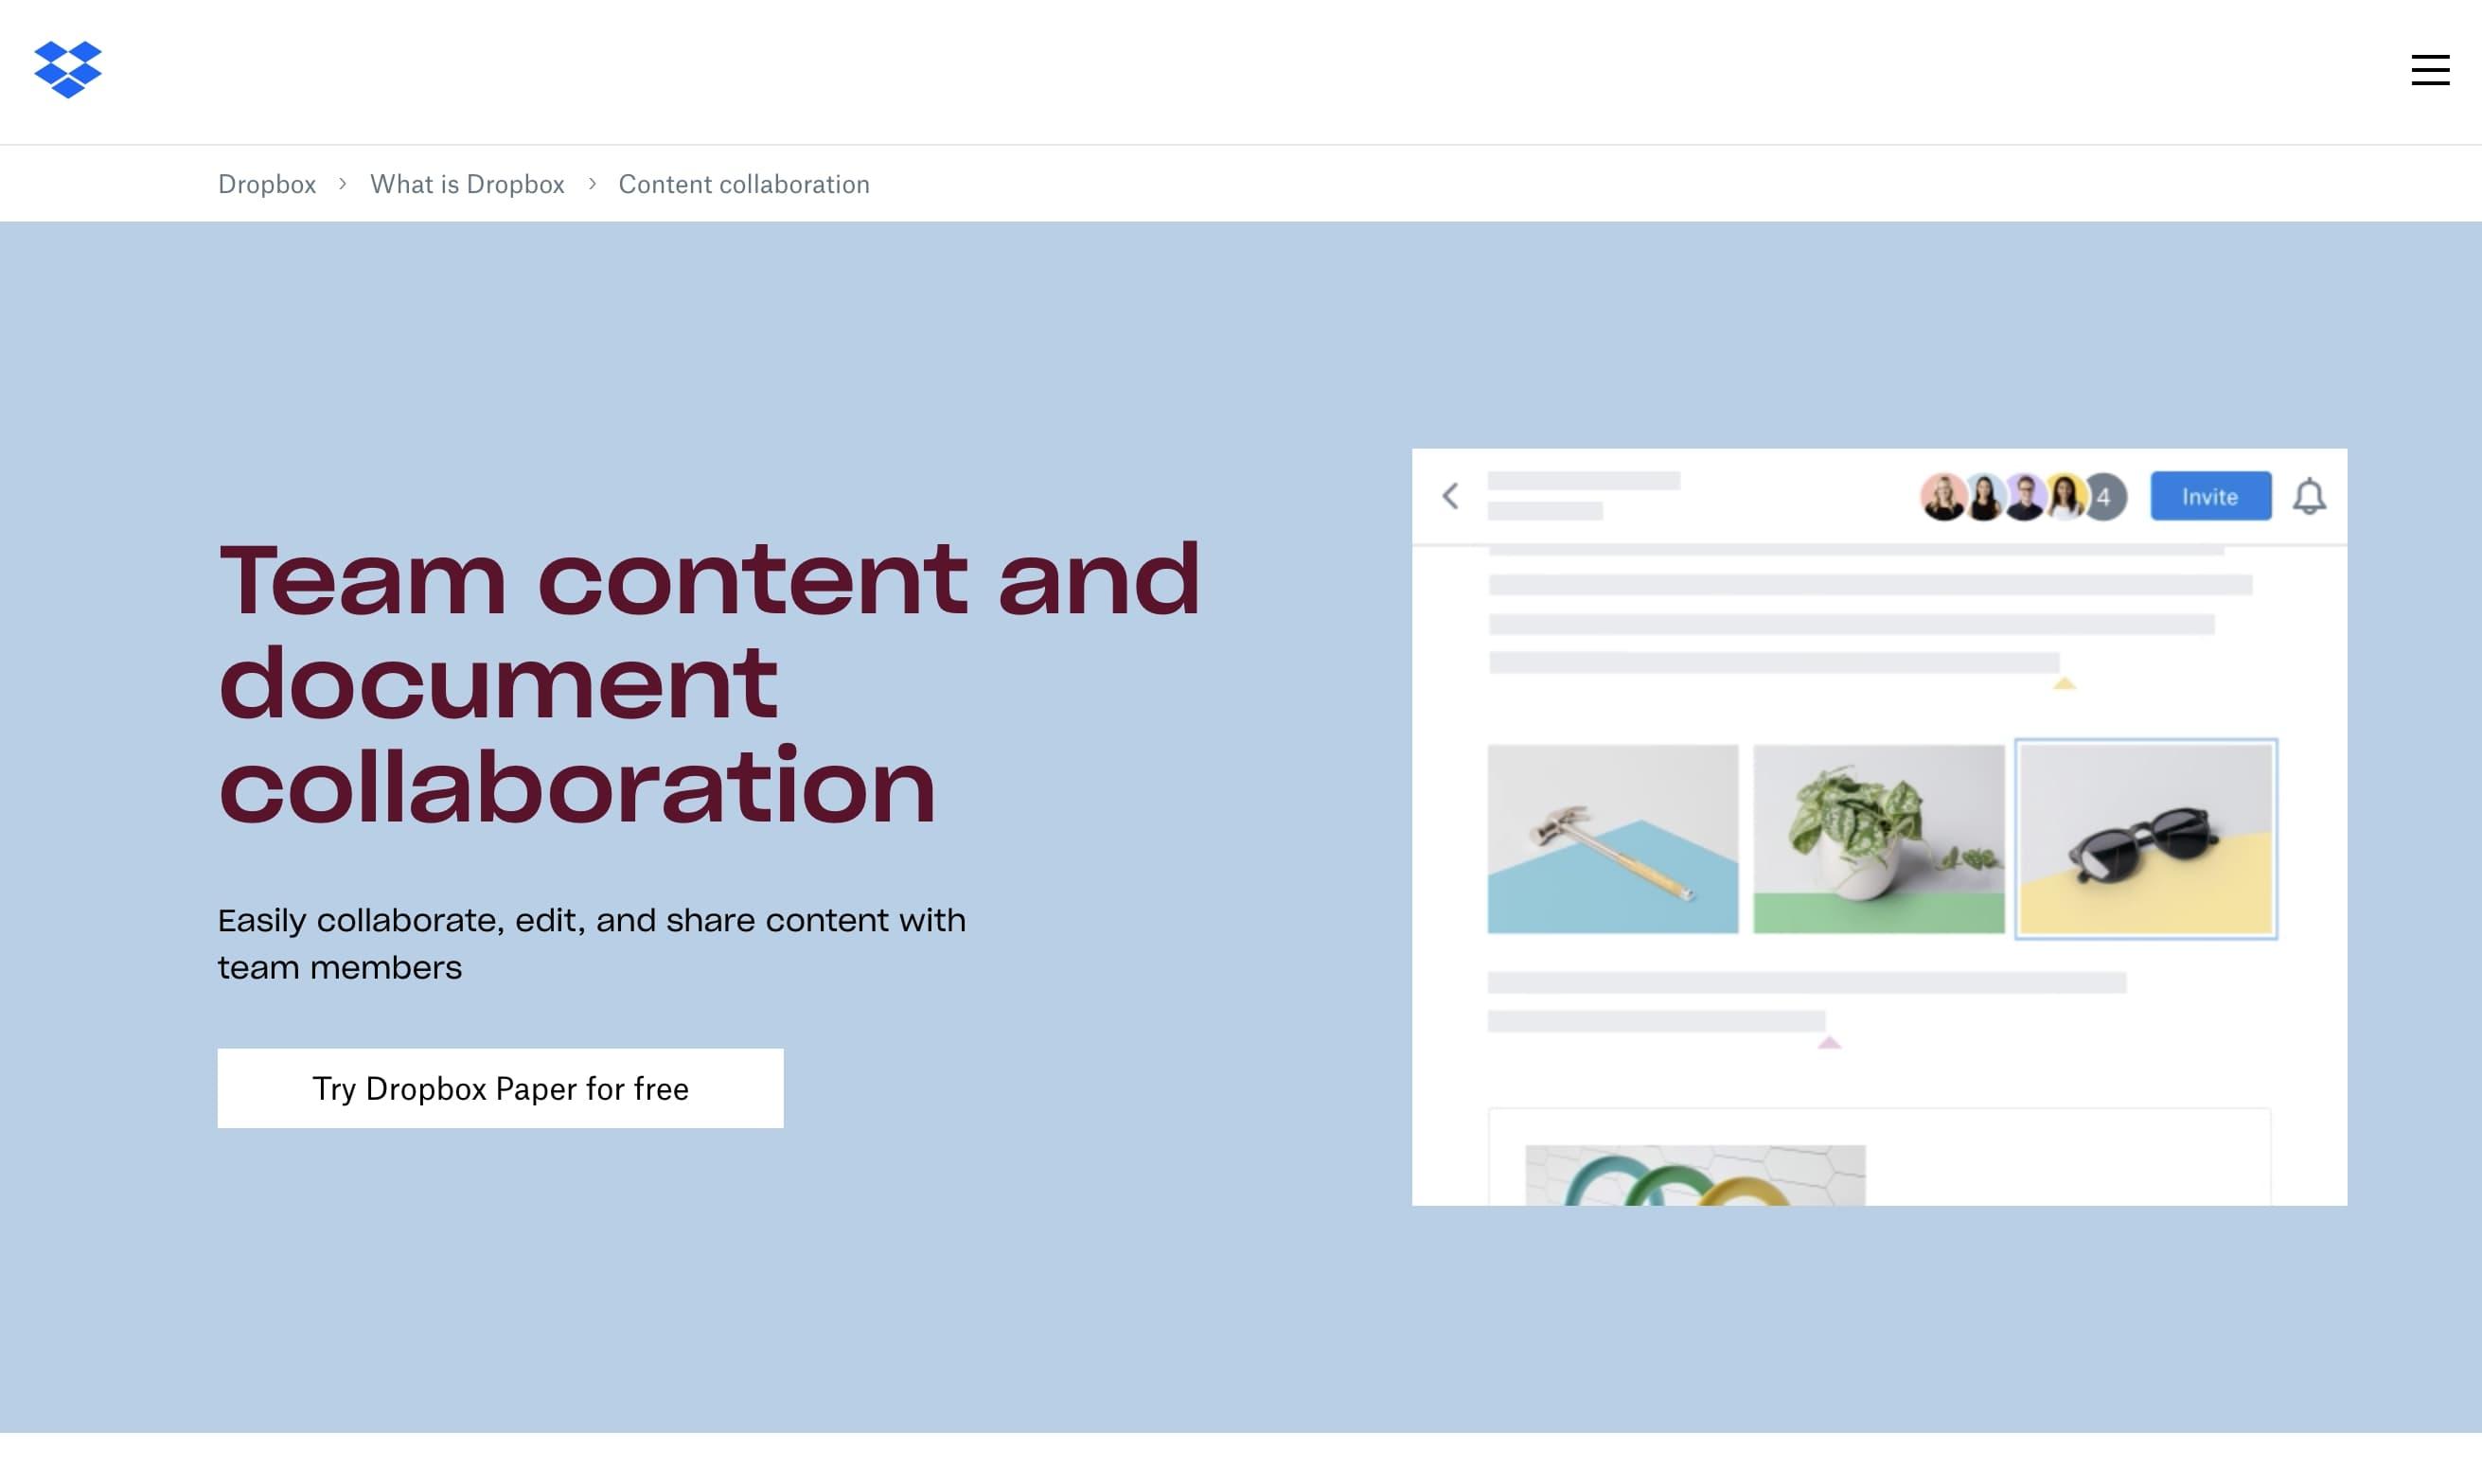 dropbox content collaboration landing page